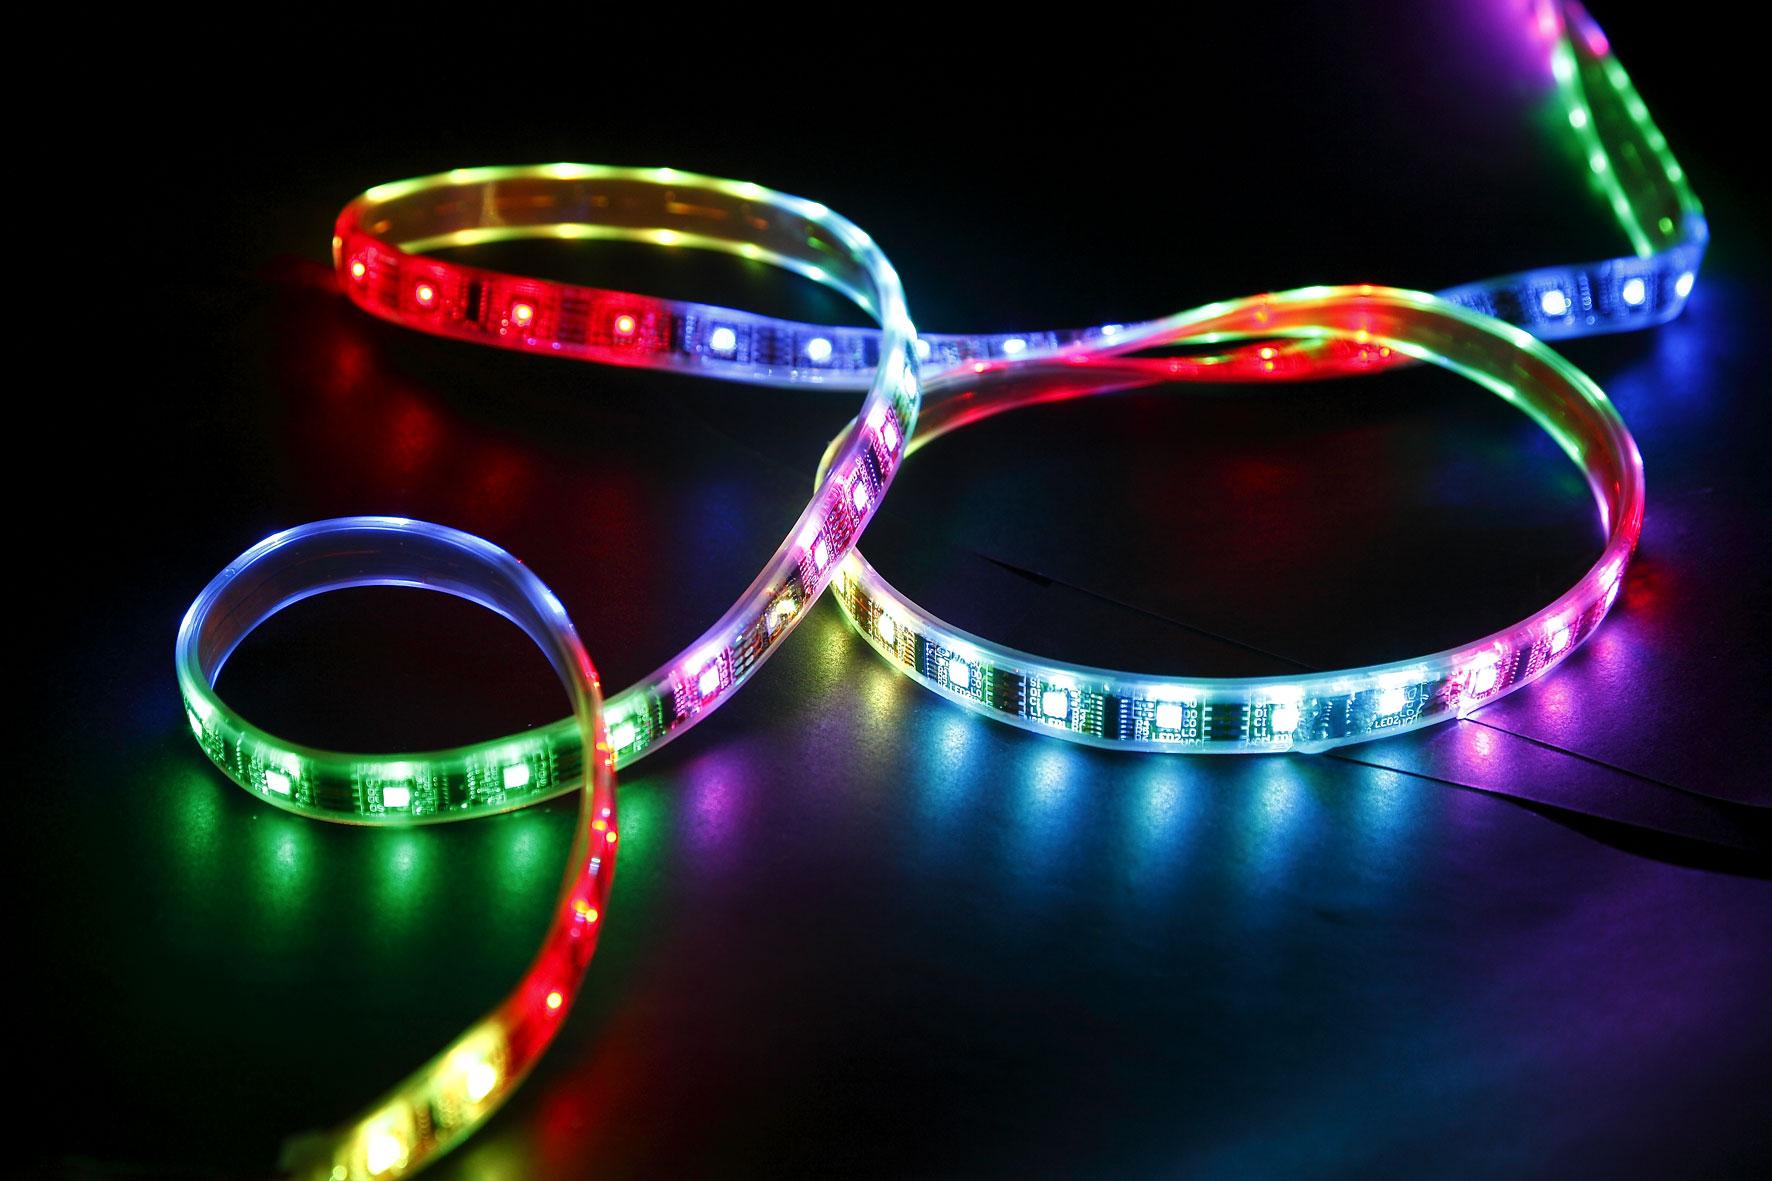 LED_Strip_variabel_150_LEDS Stilvolle Led Lampen 20 Watt Dekorationen